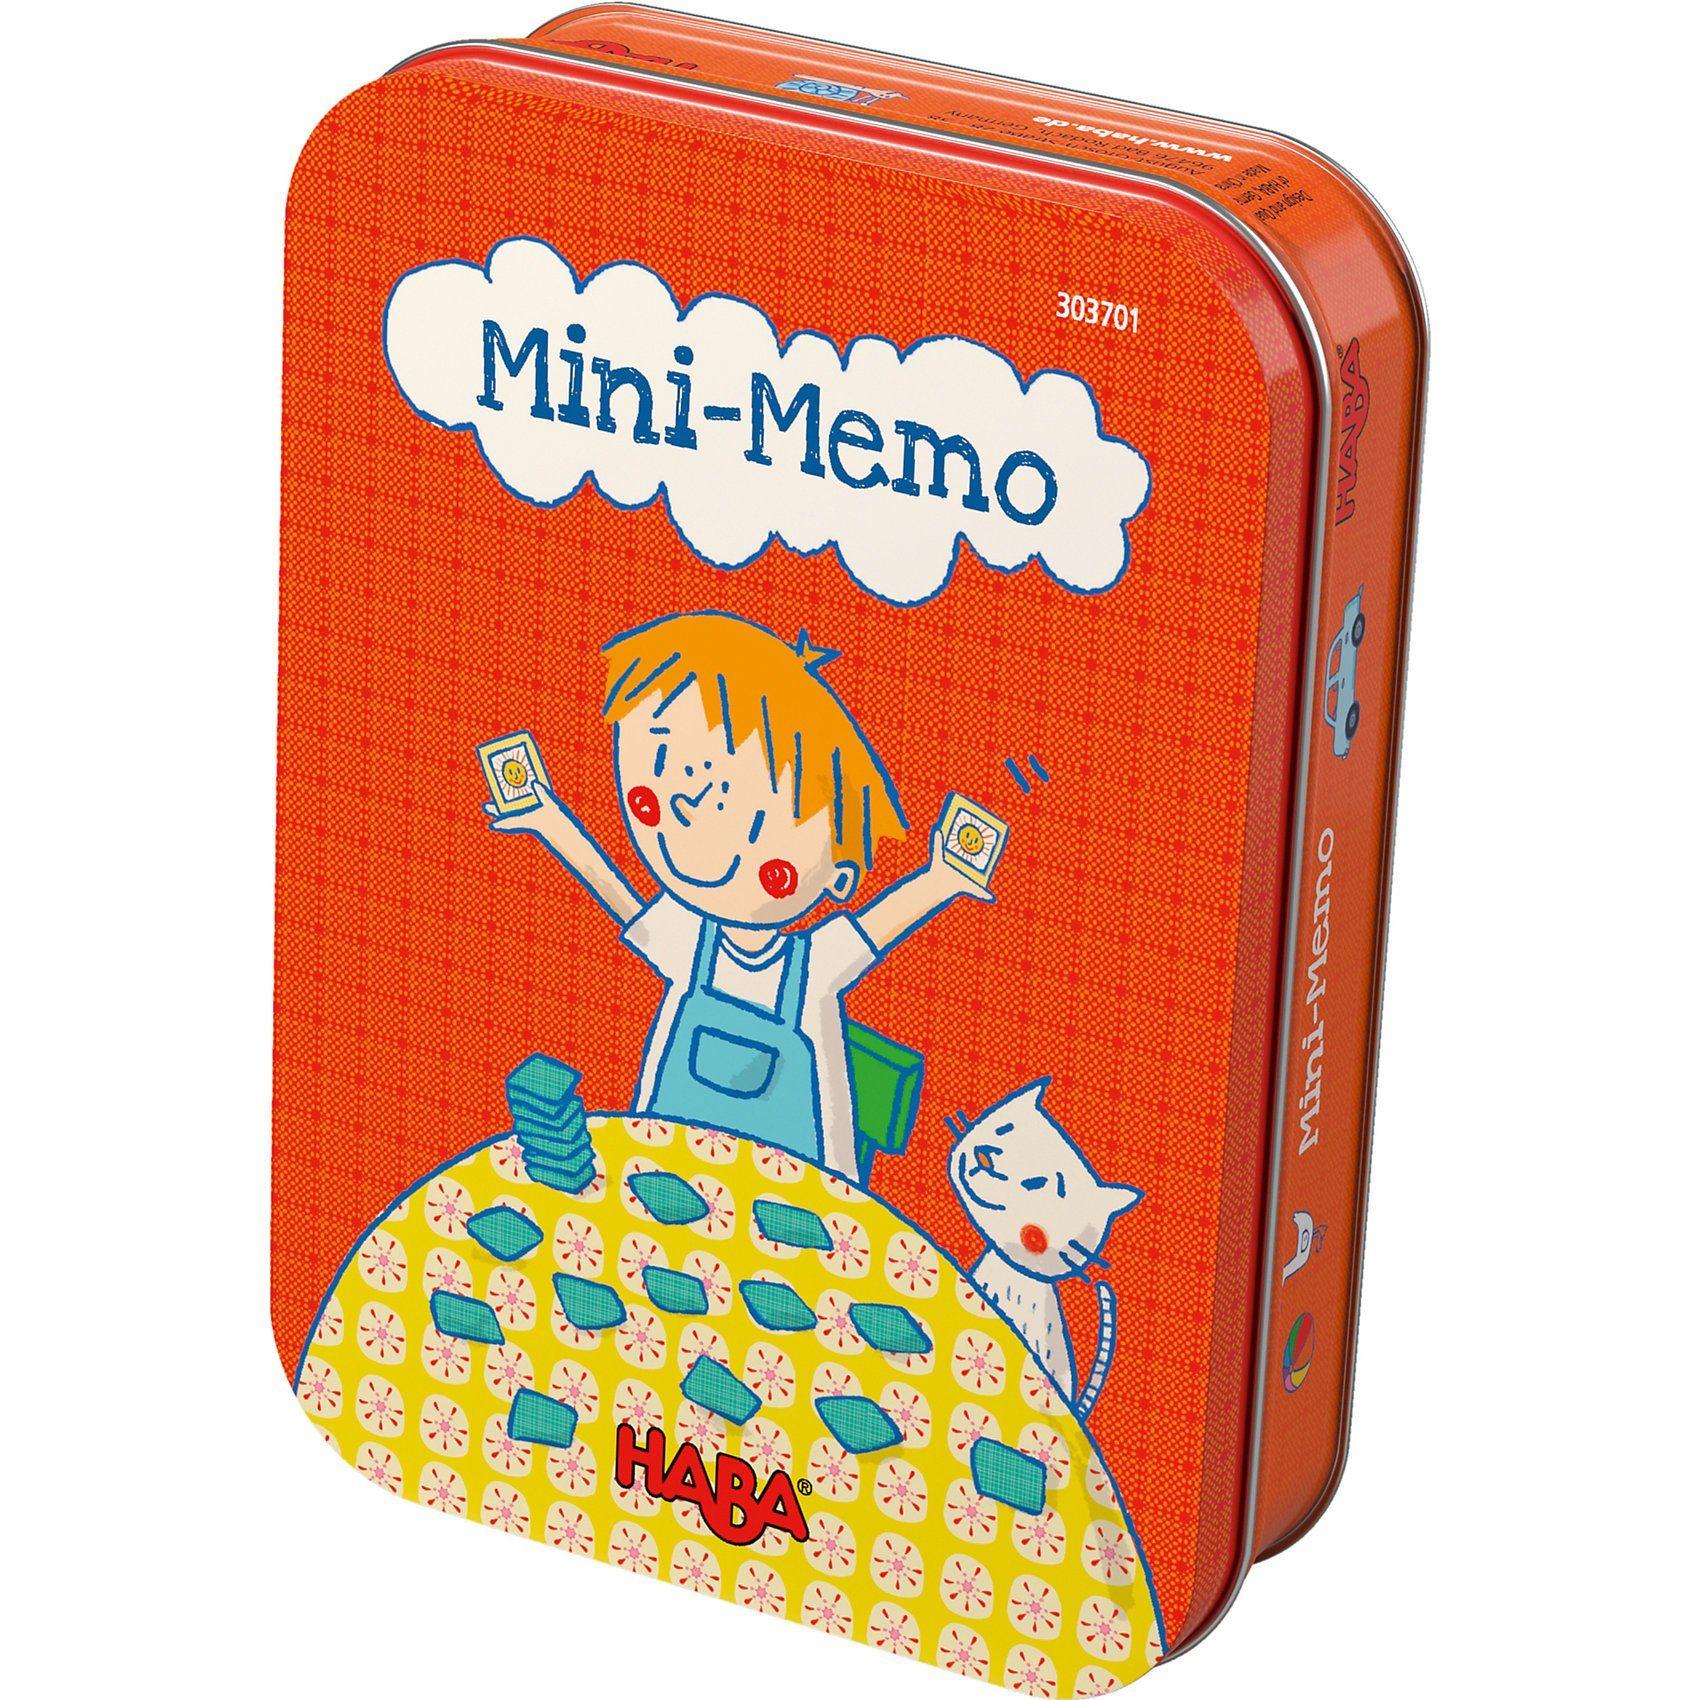 Haba Mini-Memo (Mitbringspiel)